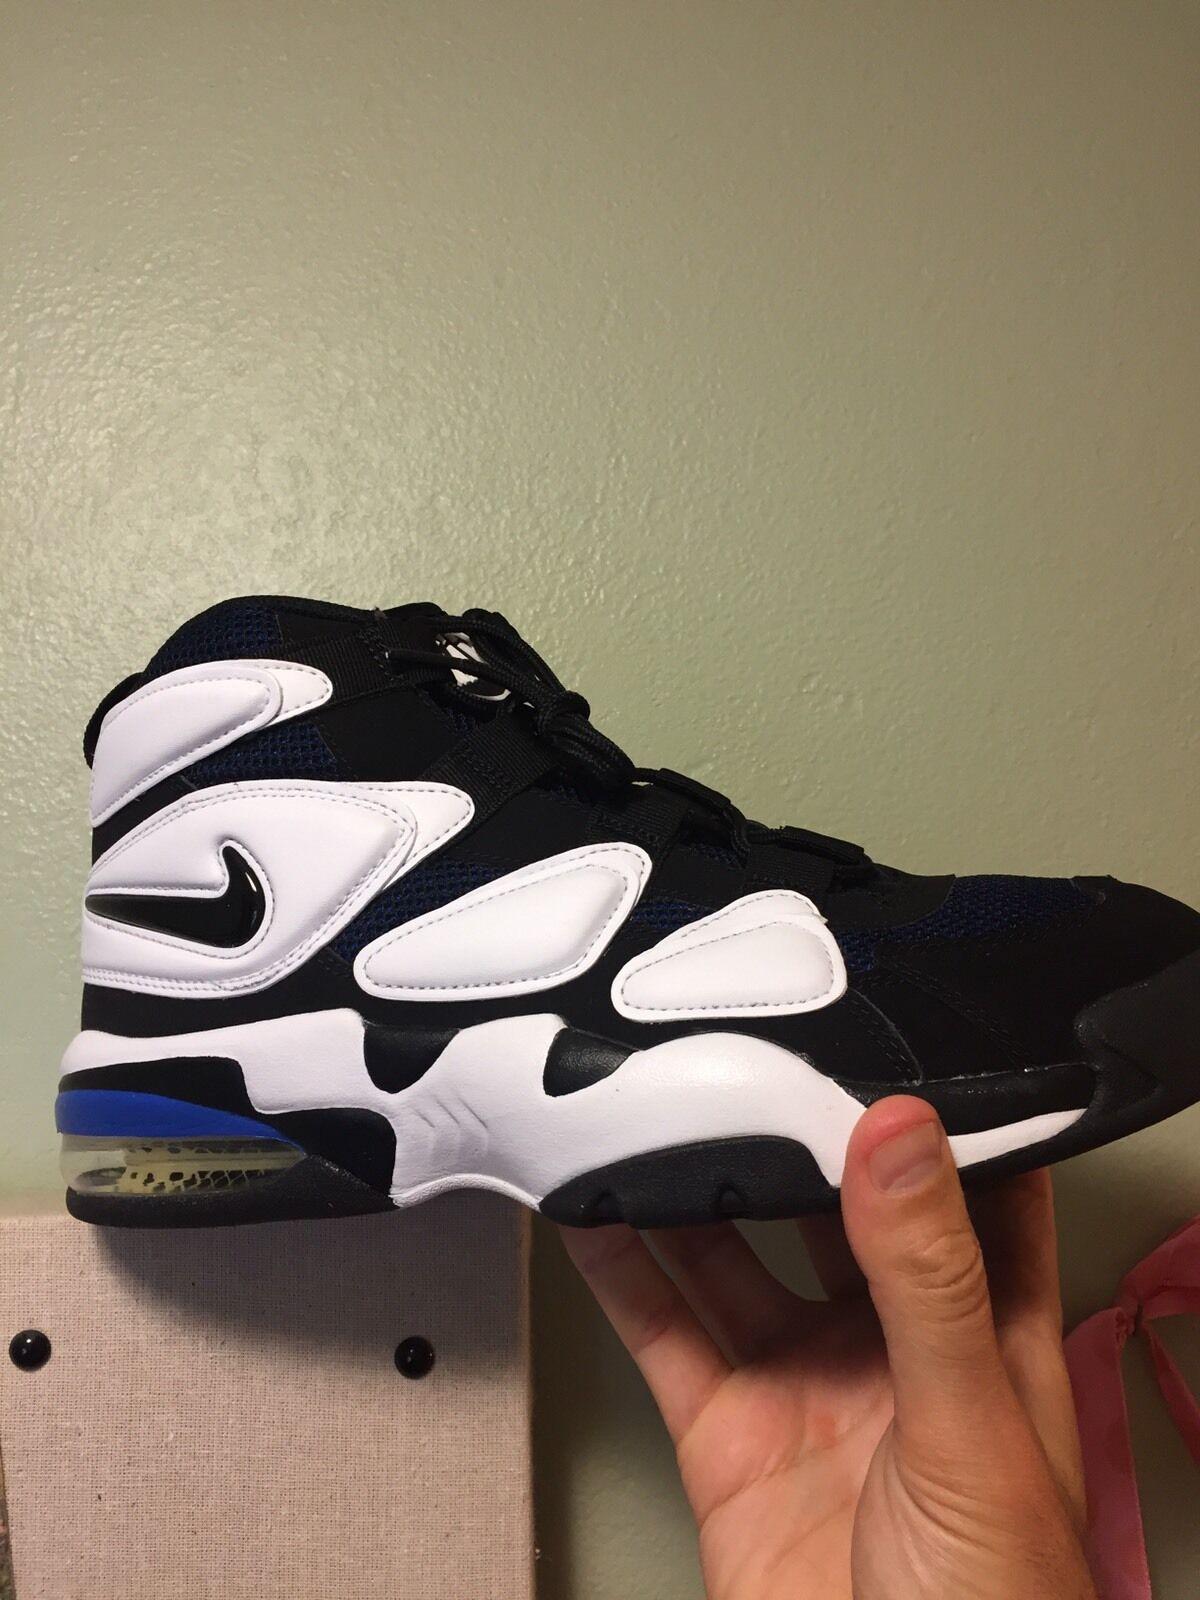 Men's Nike Air Max2 Uptempo '94 Size Box 10 (922934 101) No Box Size Top 503741